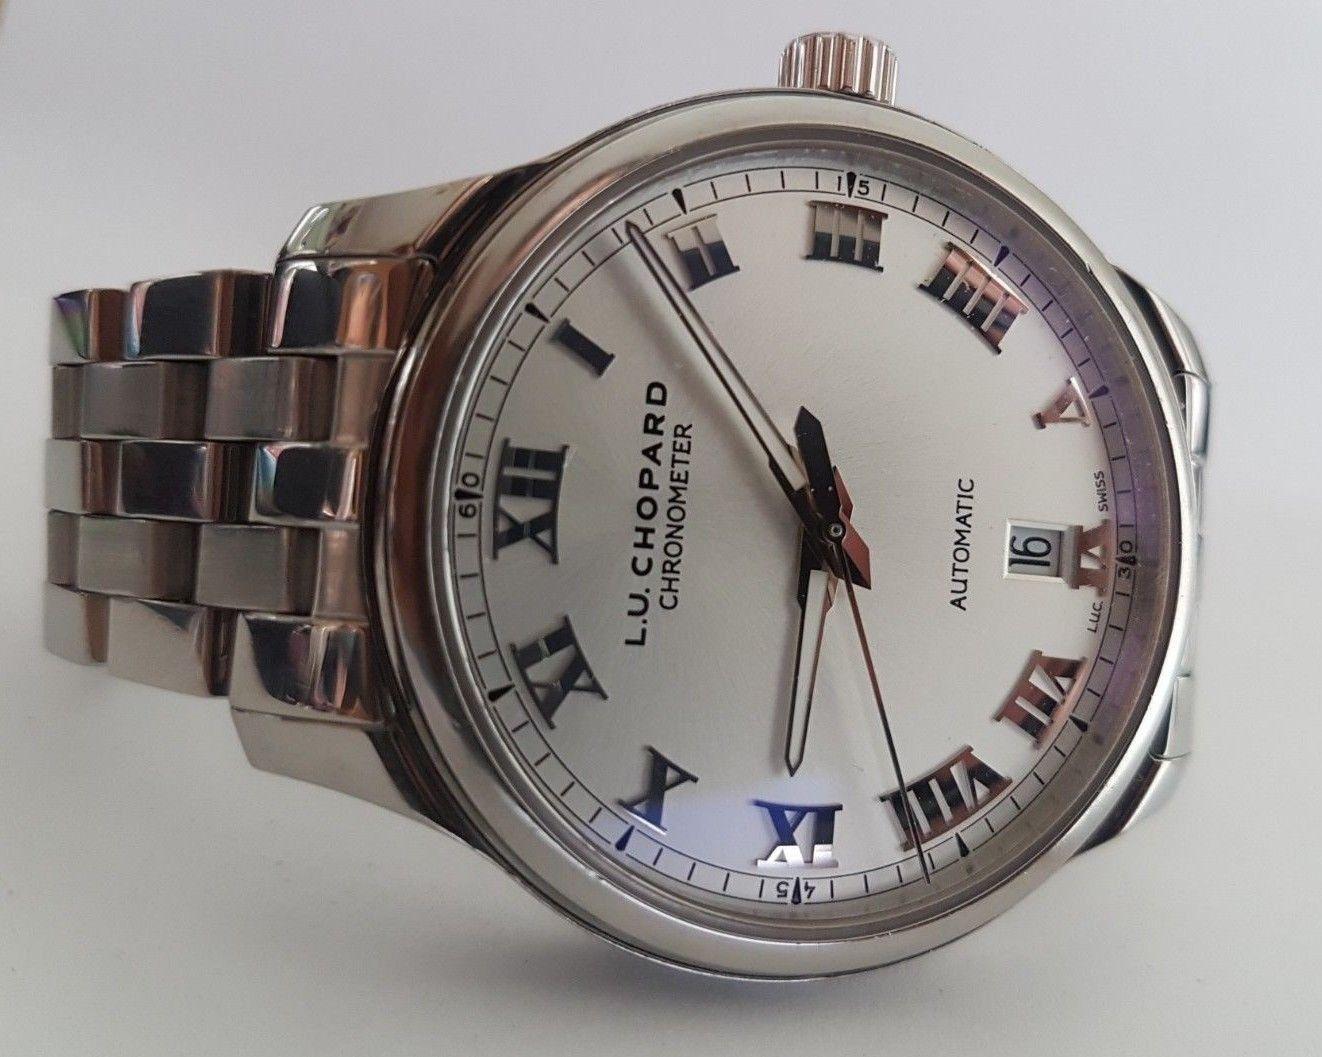 cab3a50be Chopard L.U.C 1937 SS Ref. 158558-3001 Automatic Short Bracelet wrist of  16,5cm